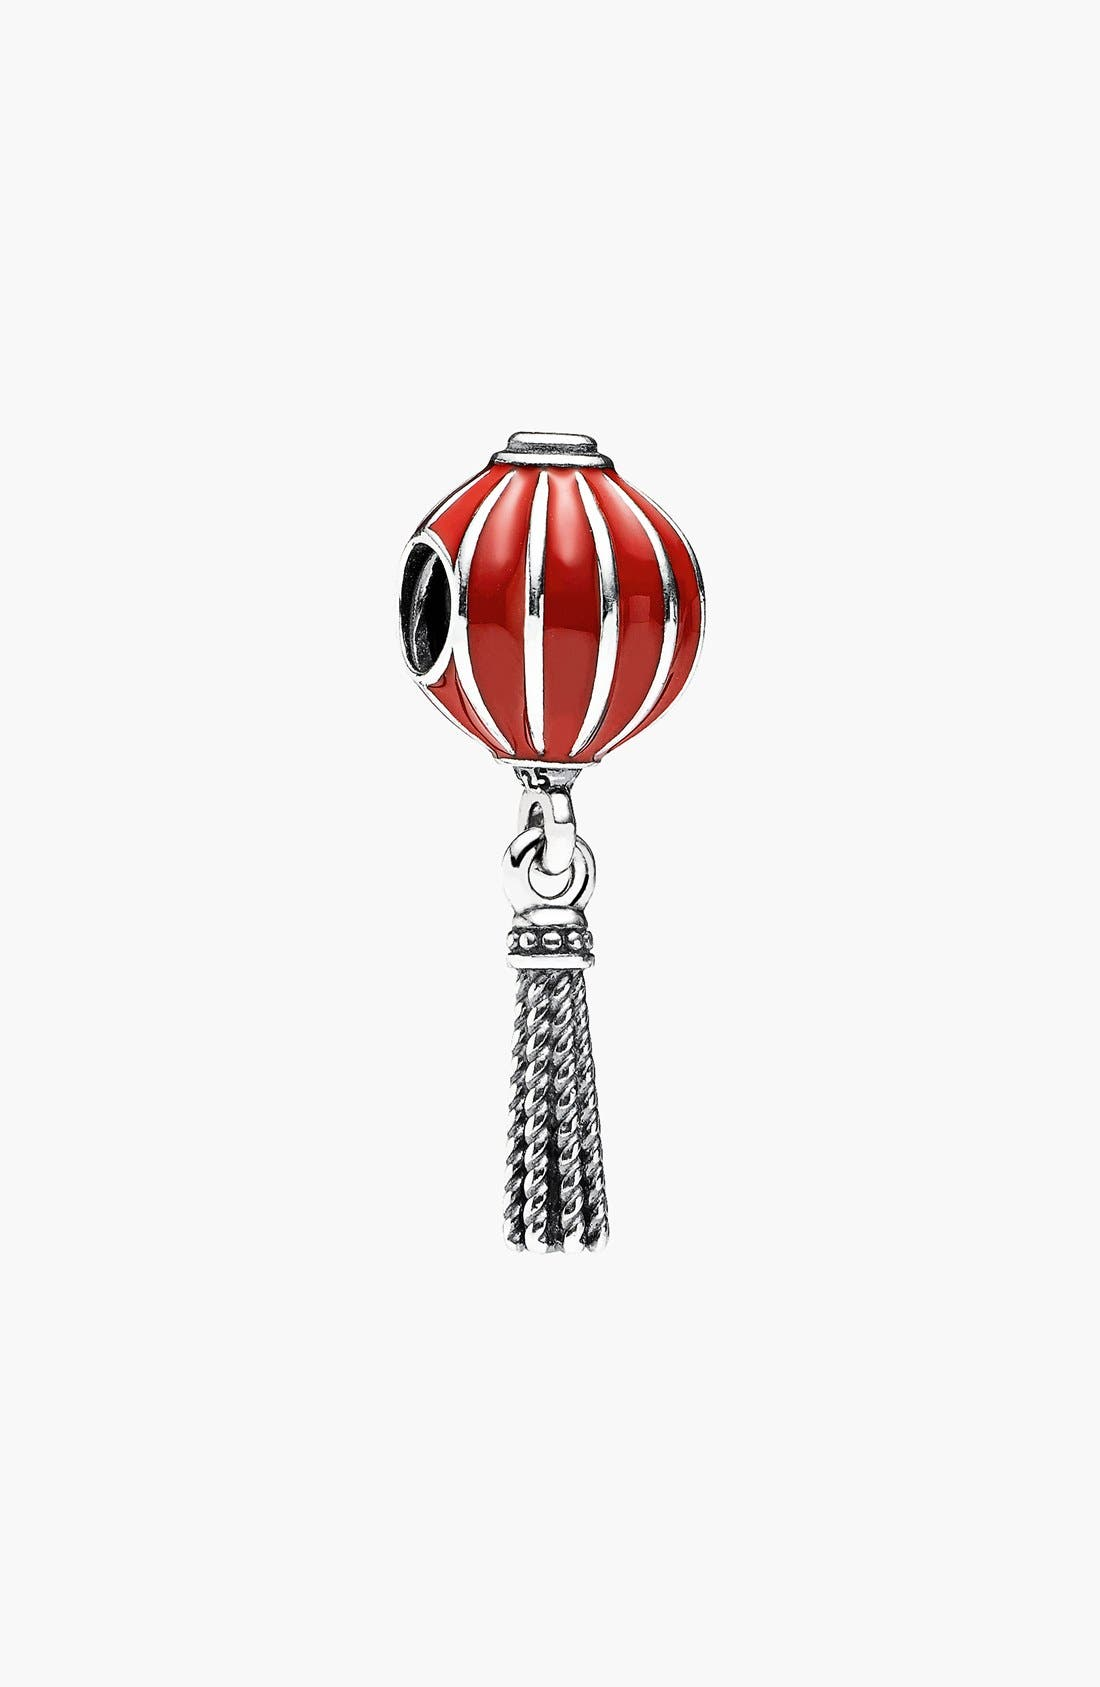 Alternate Image 1 Selected - PANDORA Lantern Dangle Charm